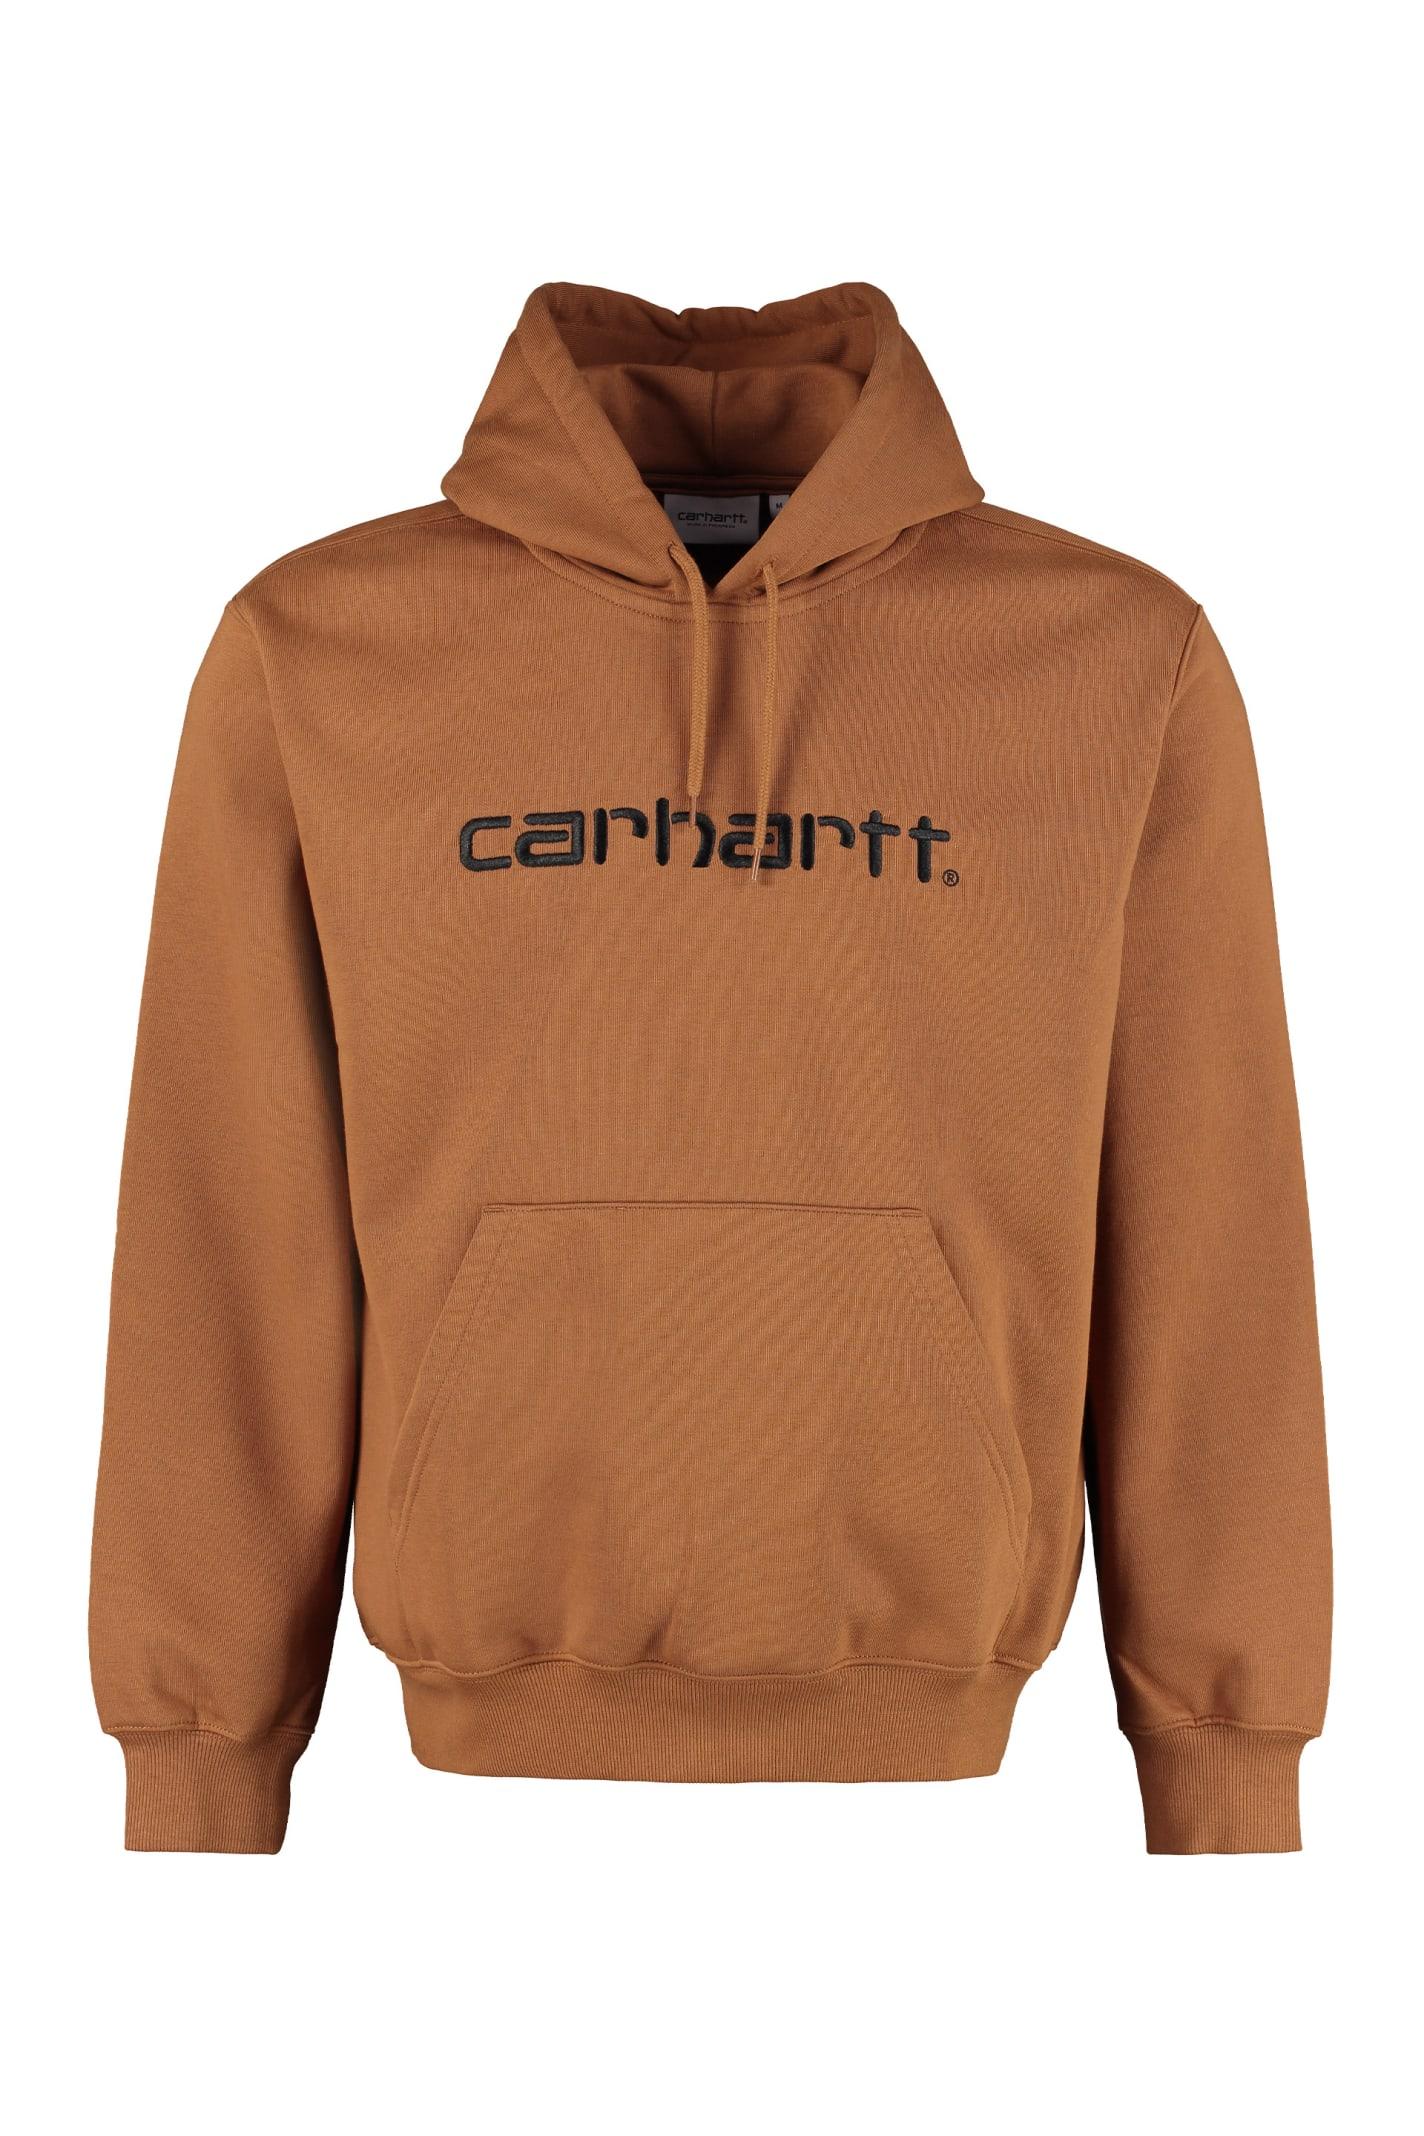 Carhartt T-shirts EMBROIDERED LOGO SWEATSHIRT